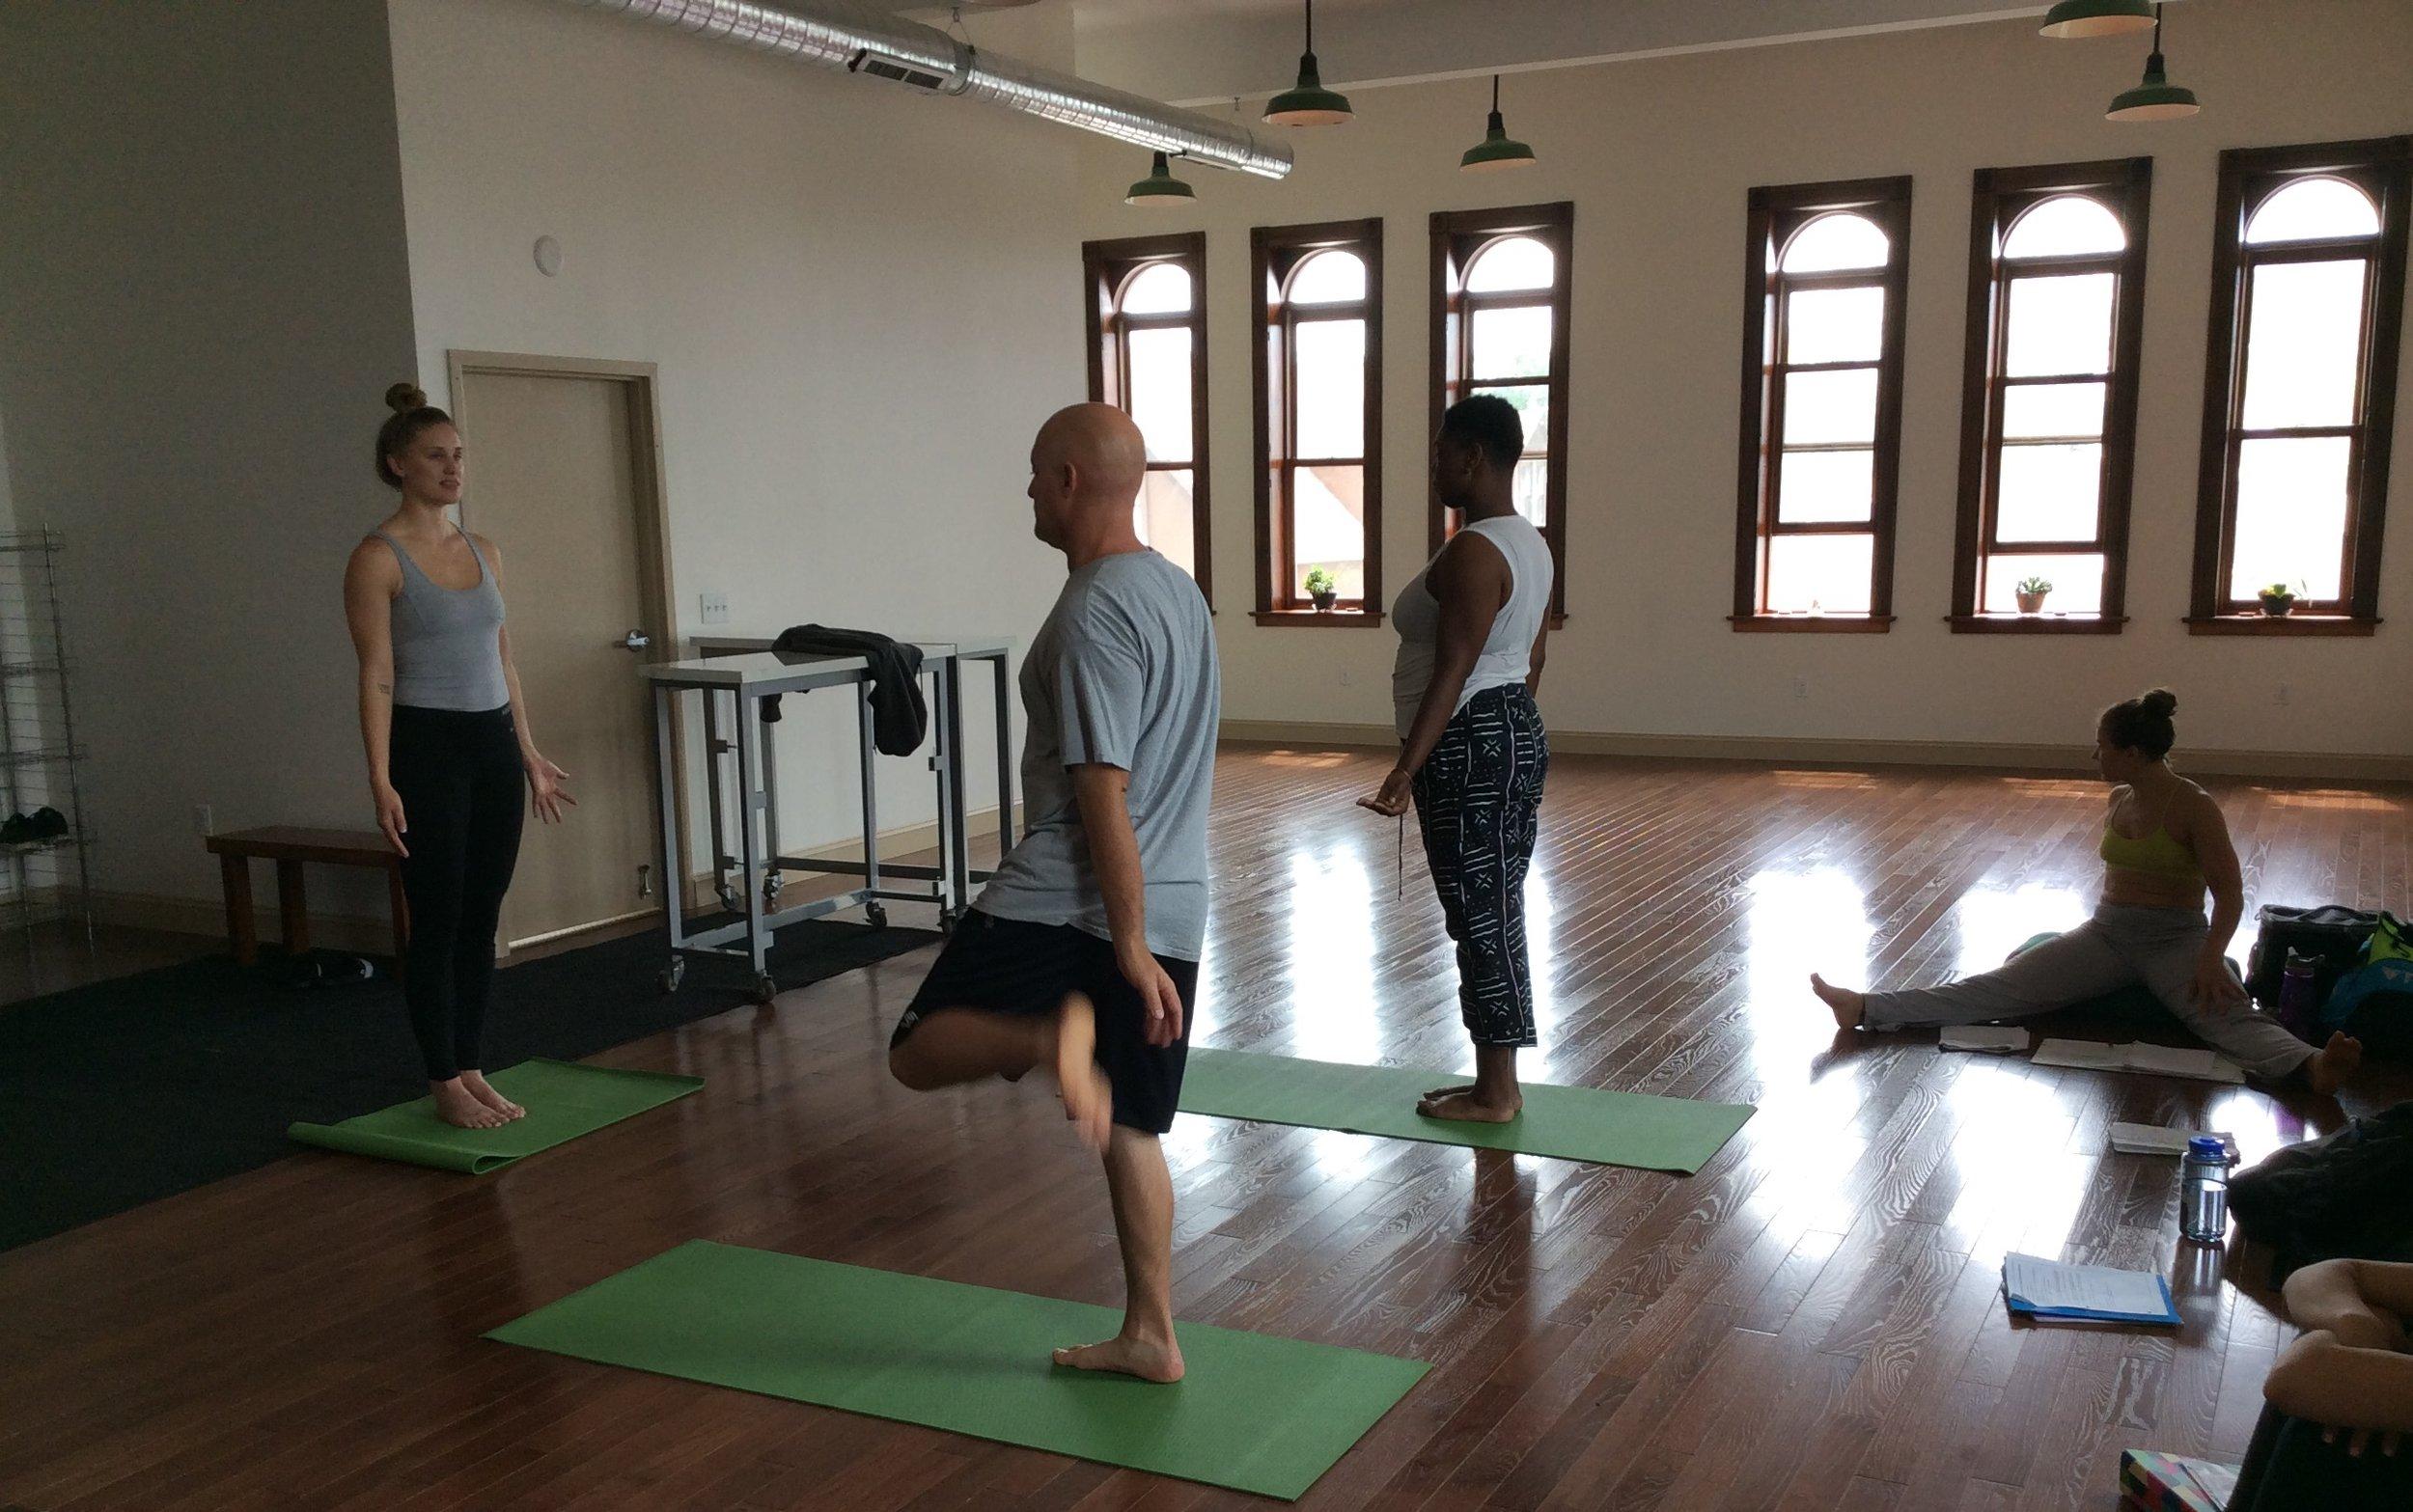 hot-yoga-teacher-training-buffalo-studio.JPG